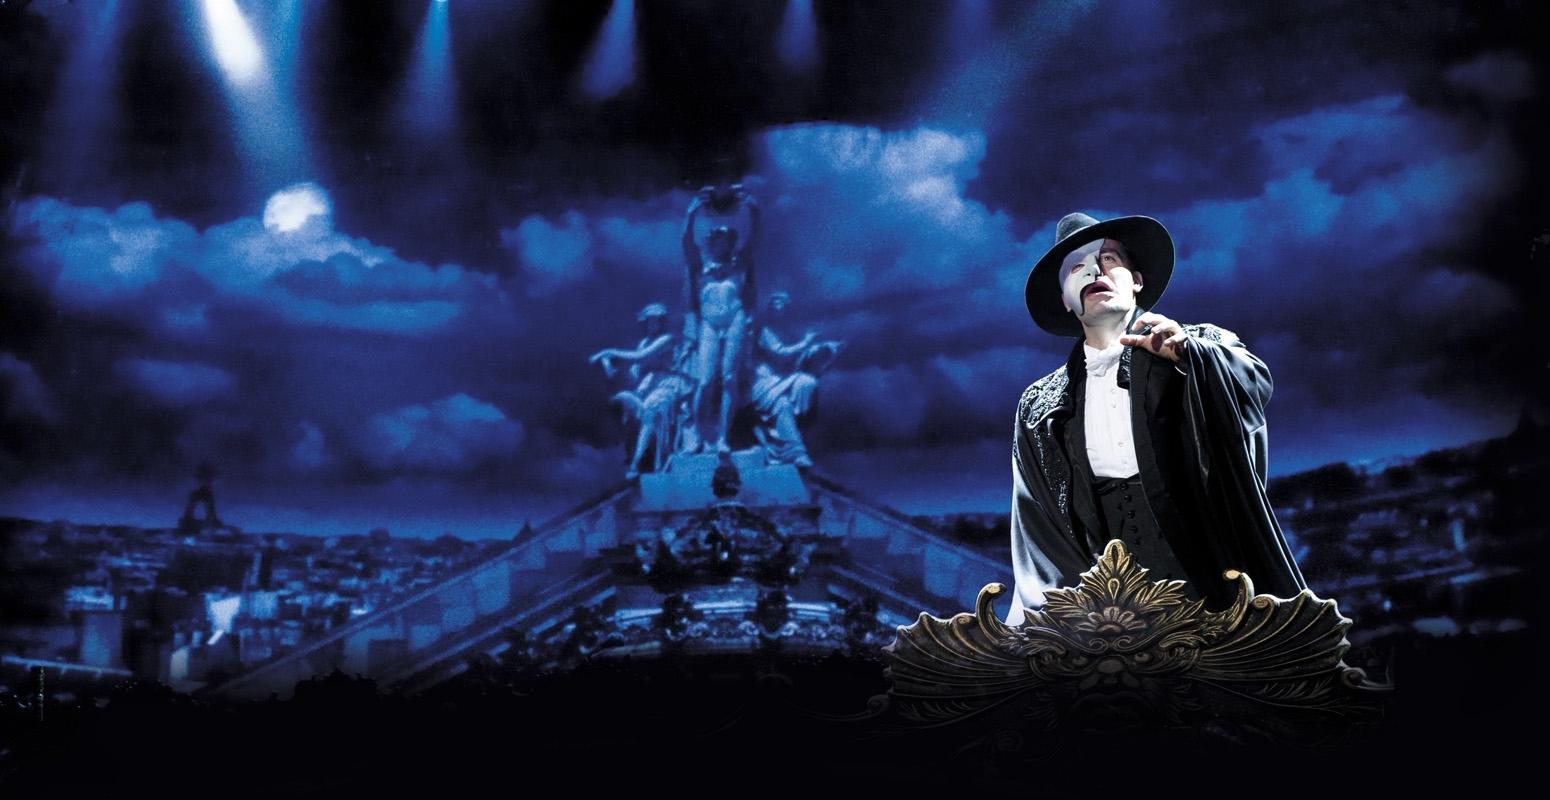 phantom of the opera london 2012 images i gave you my music hd